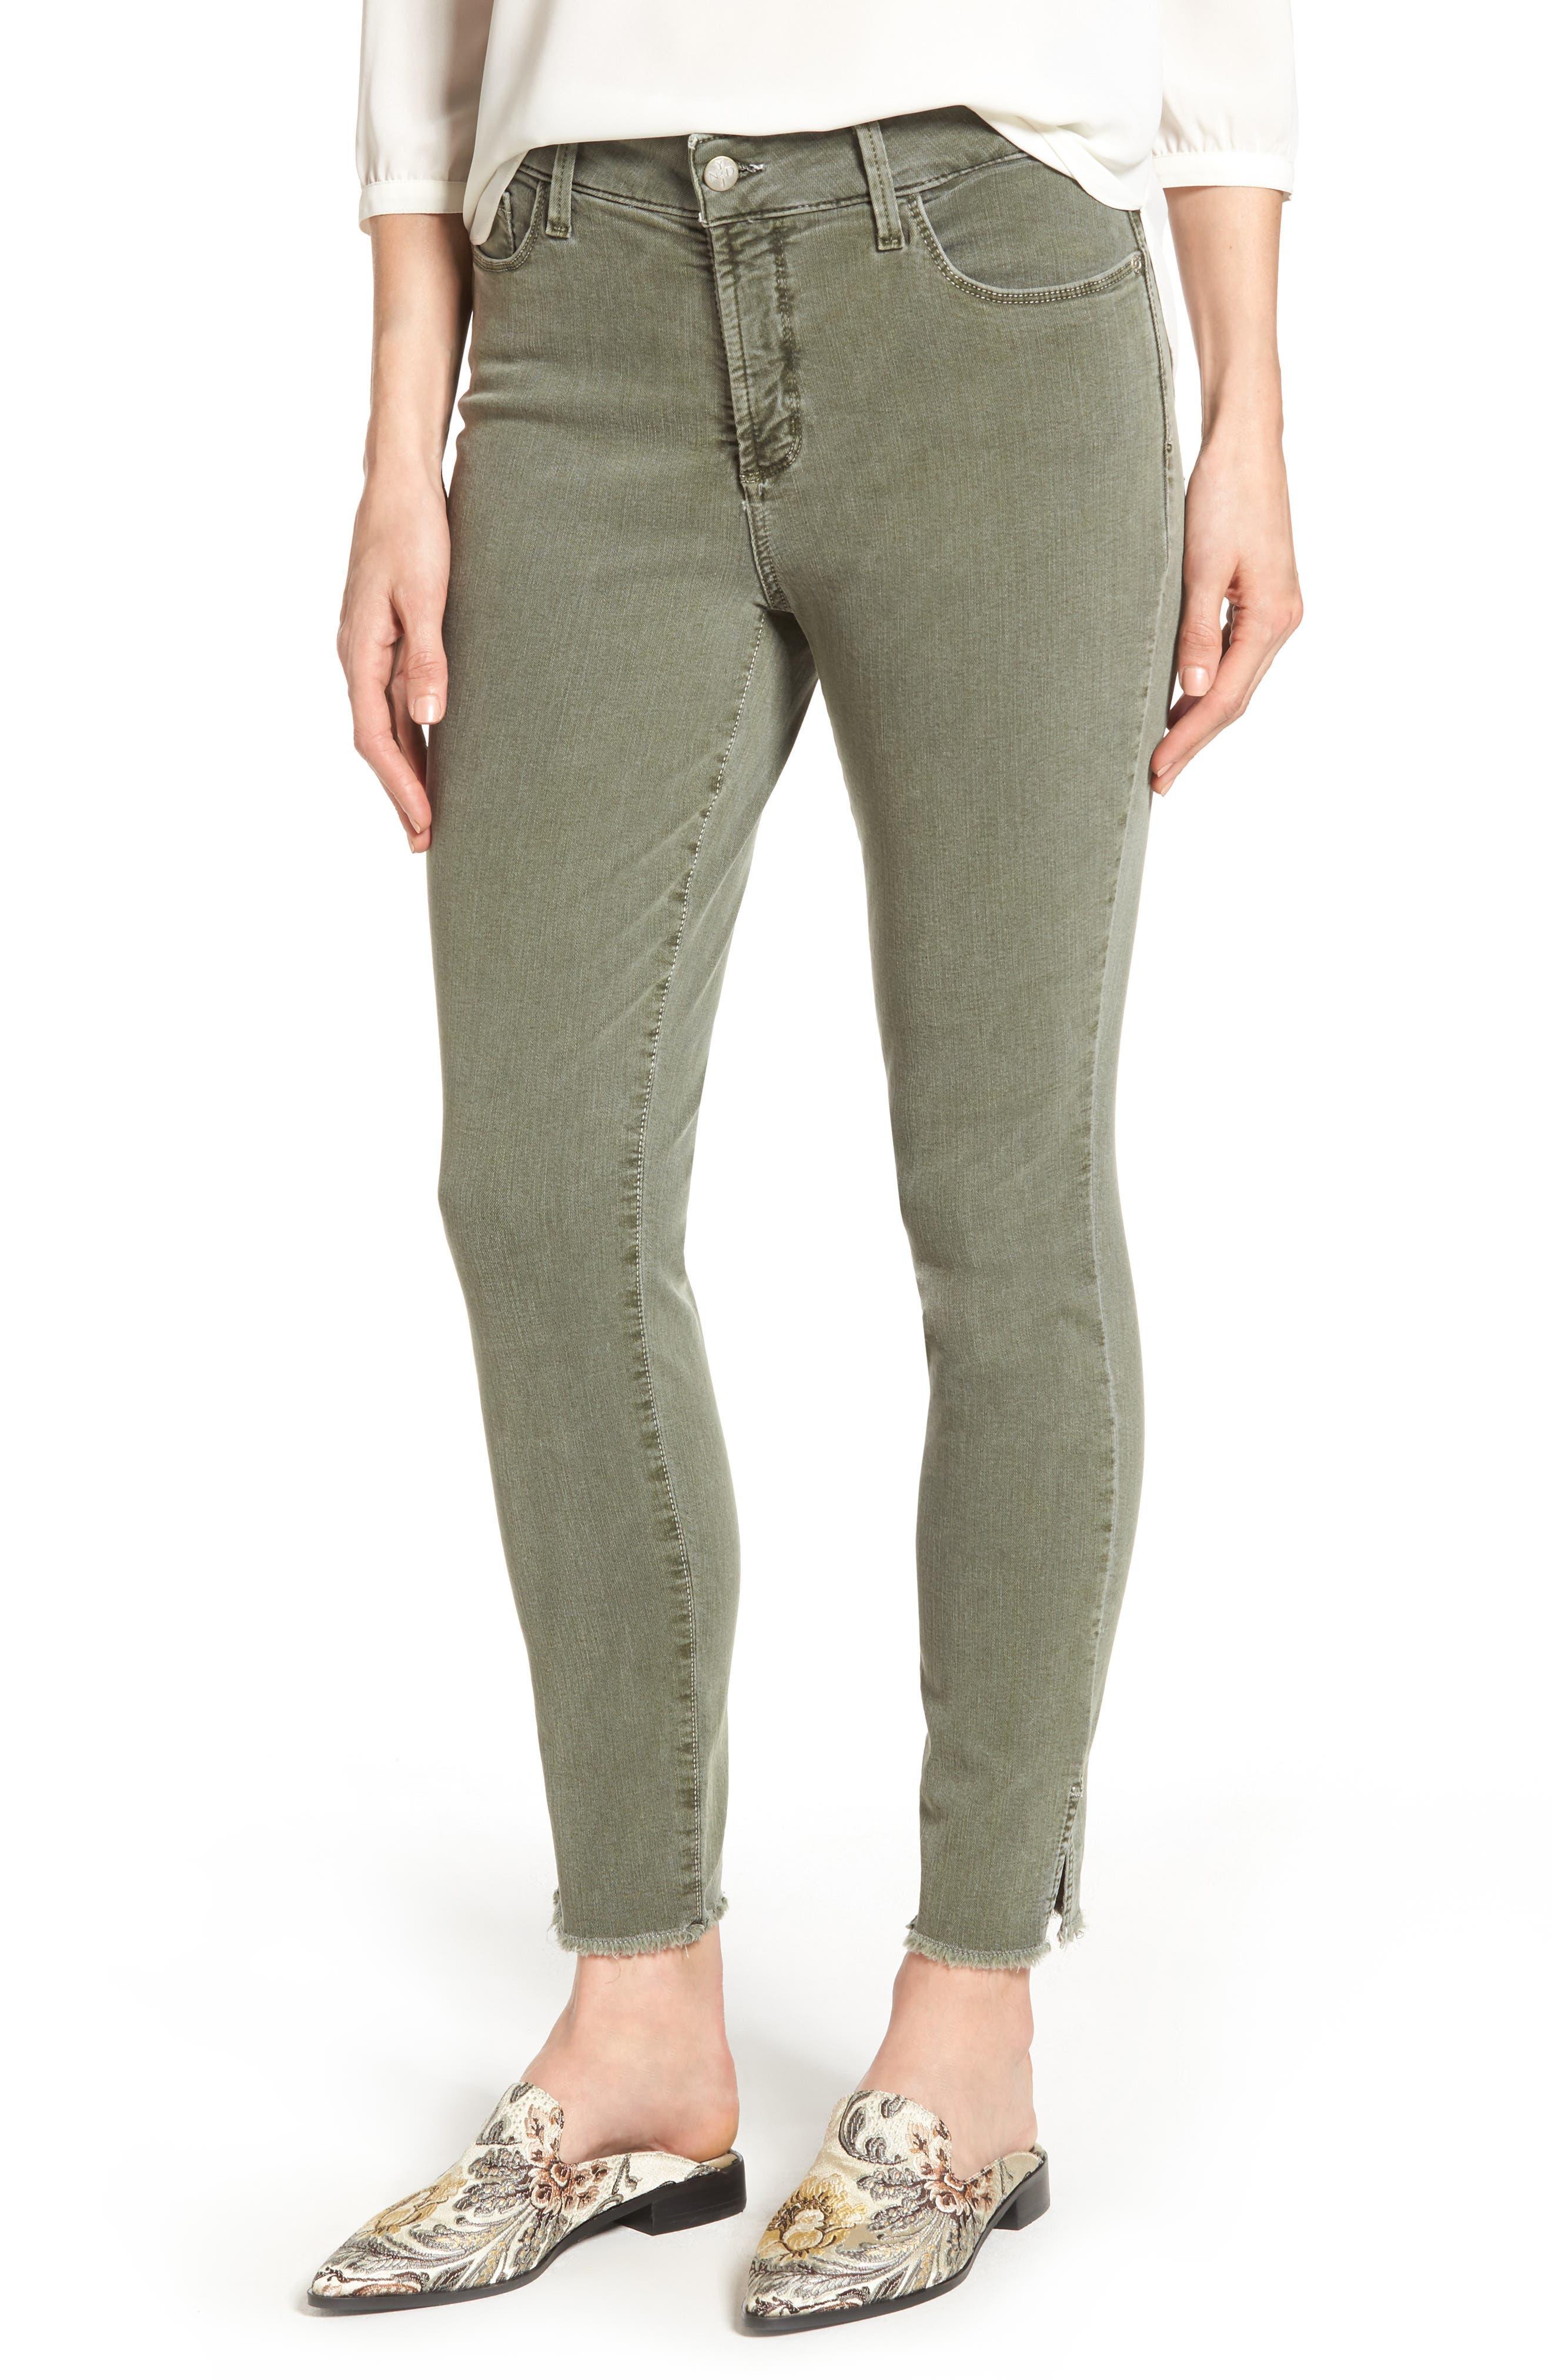 Alternate Image 1 Selected - NYDJ Ami Frayed Hem Stretch Skinny Ankle Jeans (Regular & Petite)